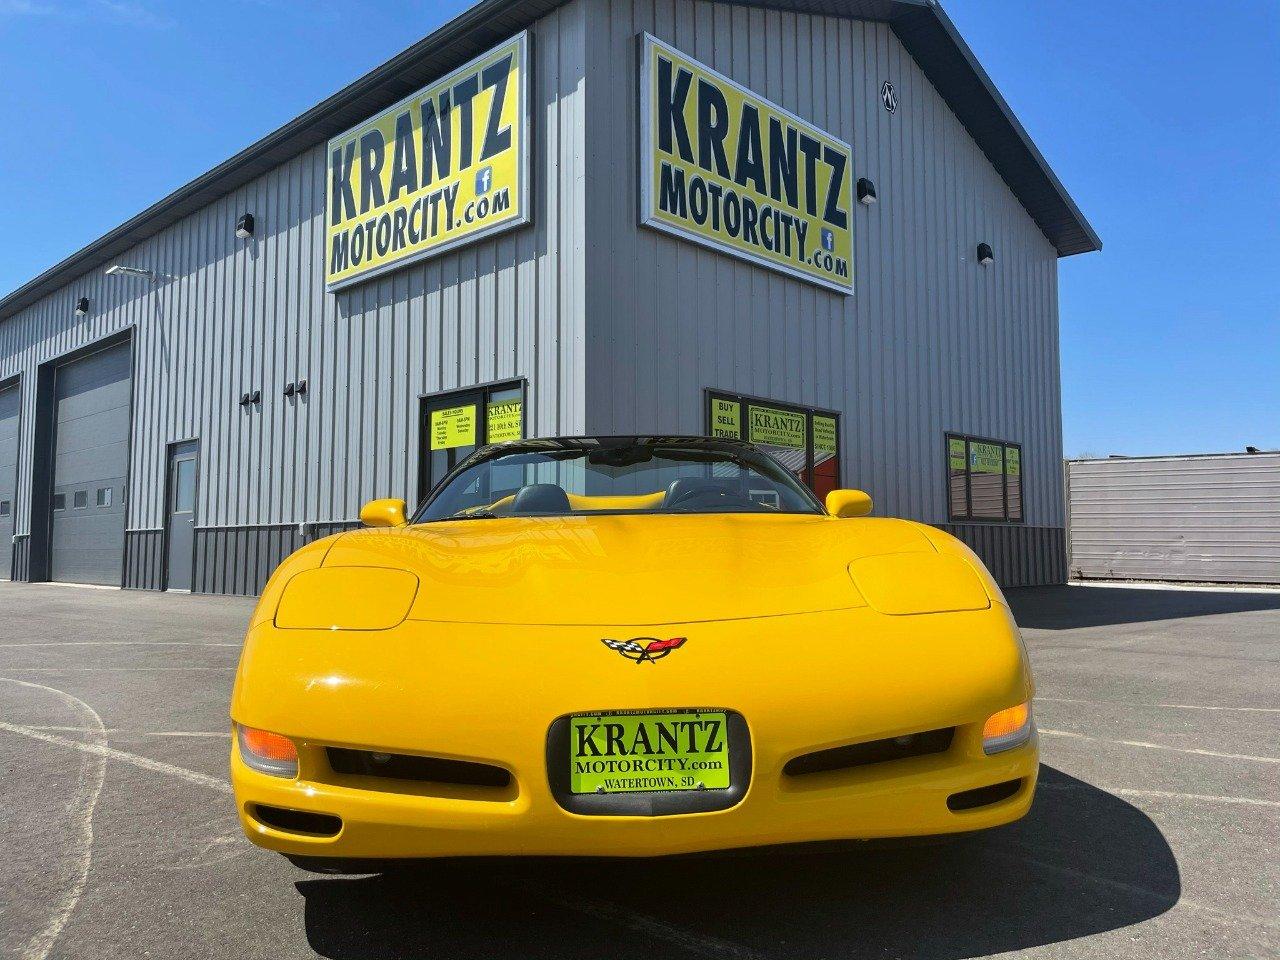 Krantz Motor City